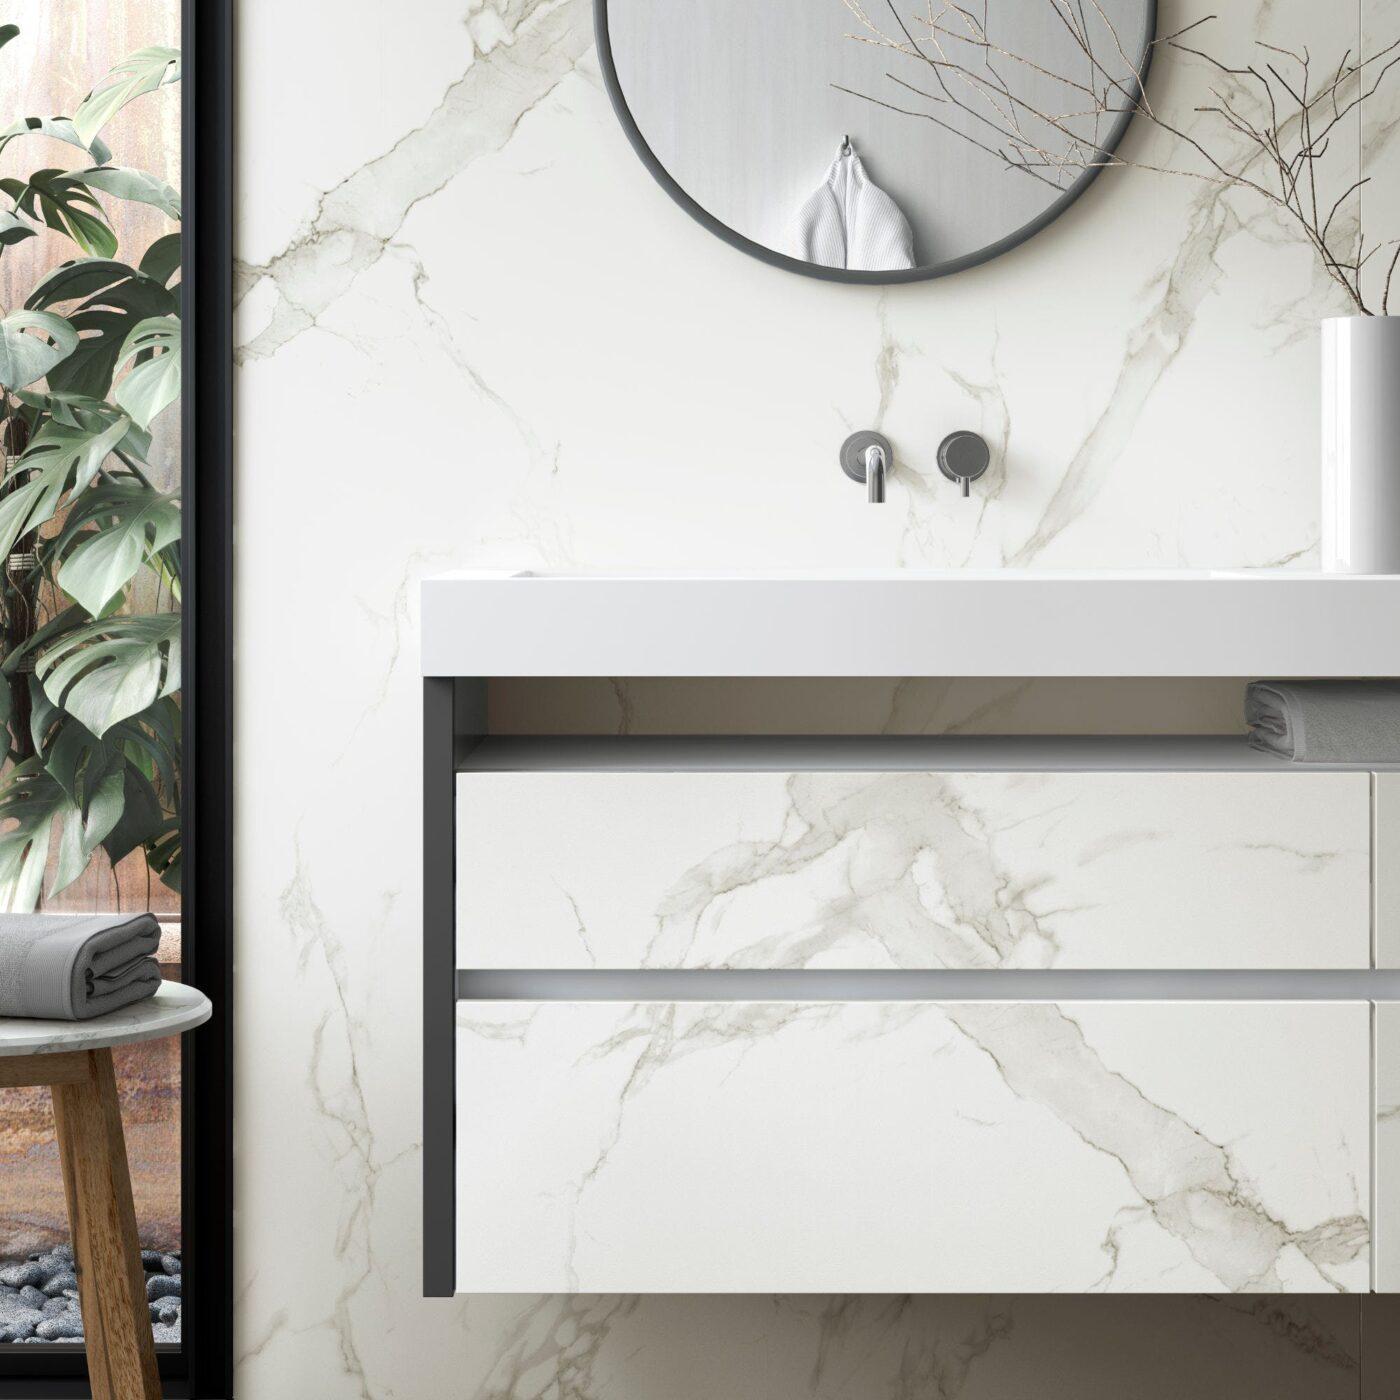 Image of Dekton Bathroom Aura 15 Detalle in Five cool design ideas for grey and white bathrooms - Cosentino